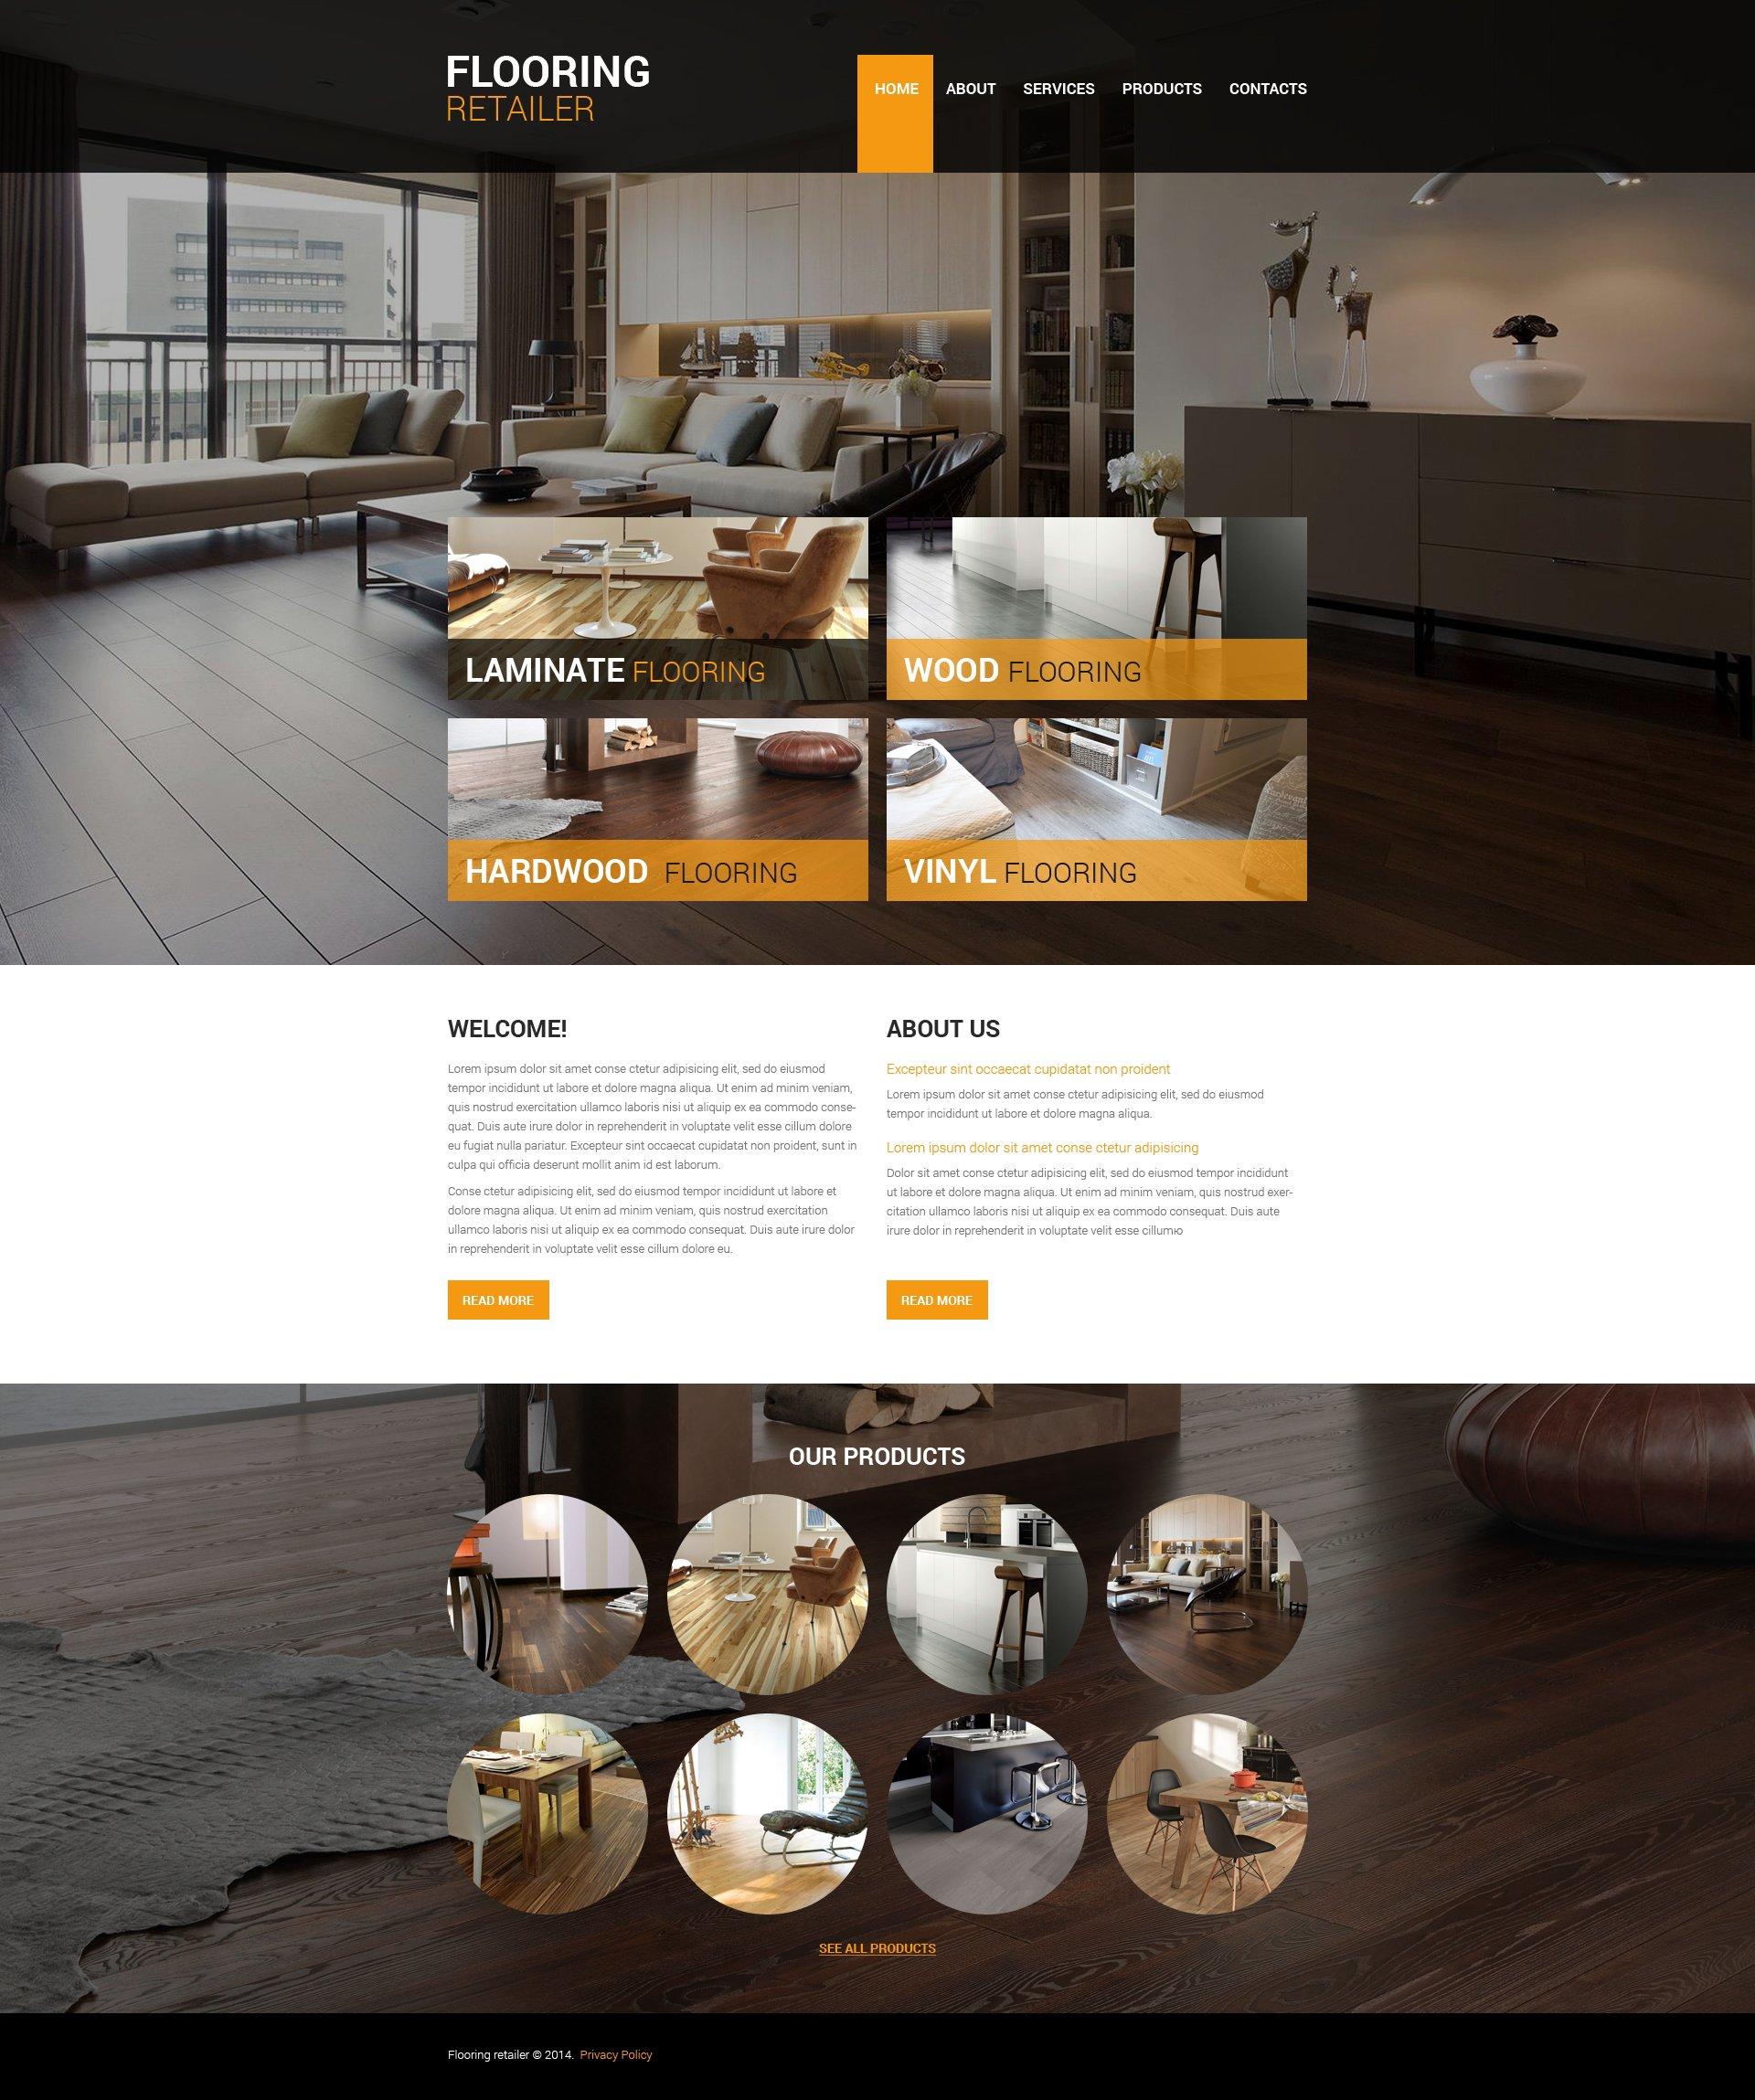 Flooring responsive website template 48139 flooring responsive website template pronofoot35fo Image collections